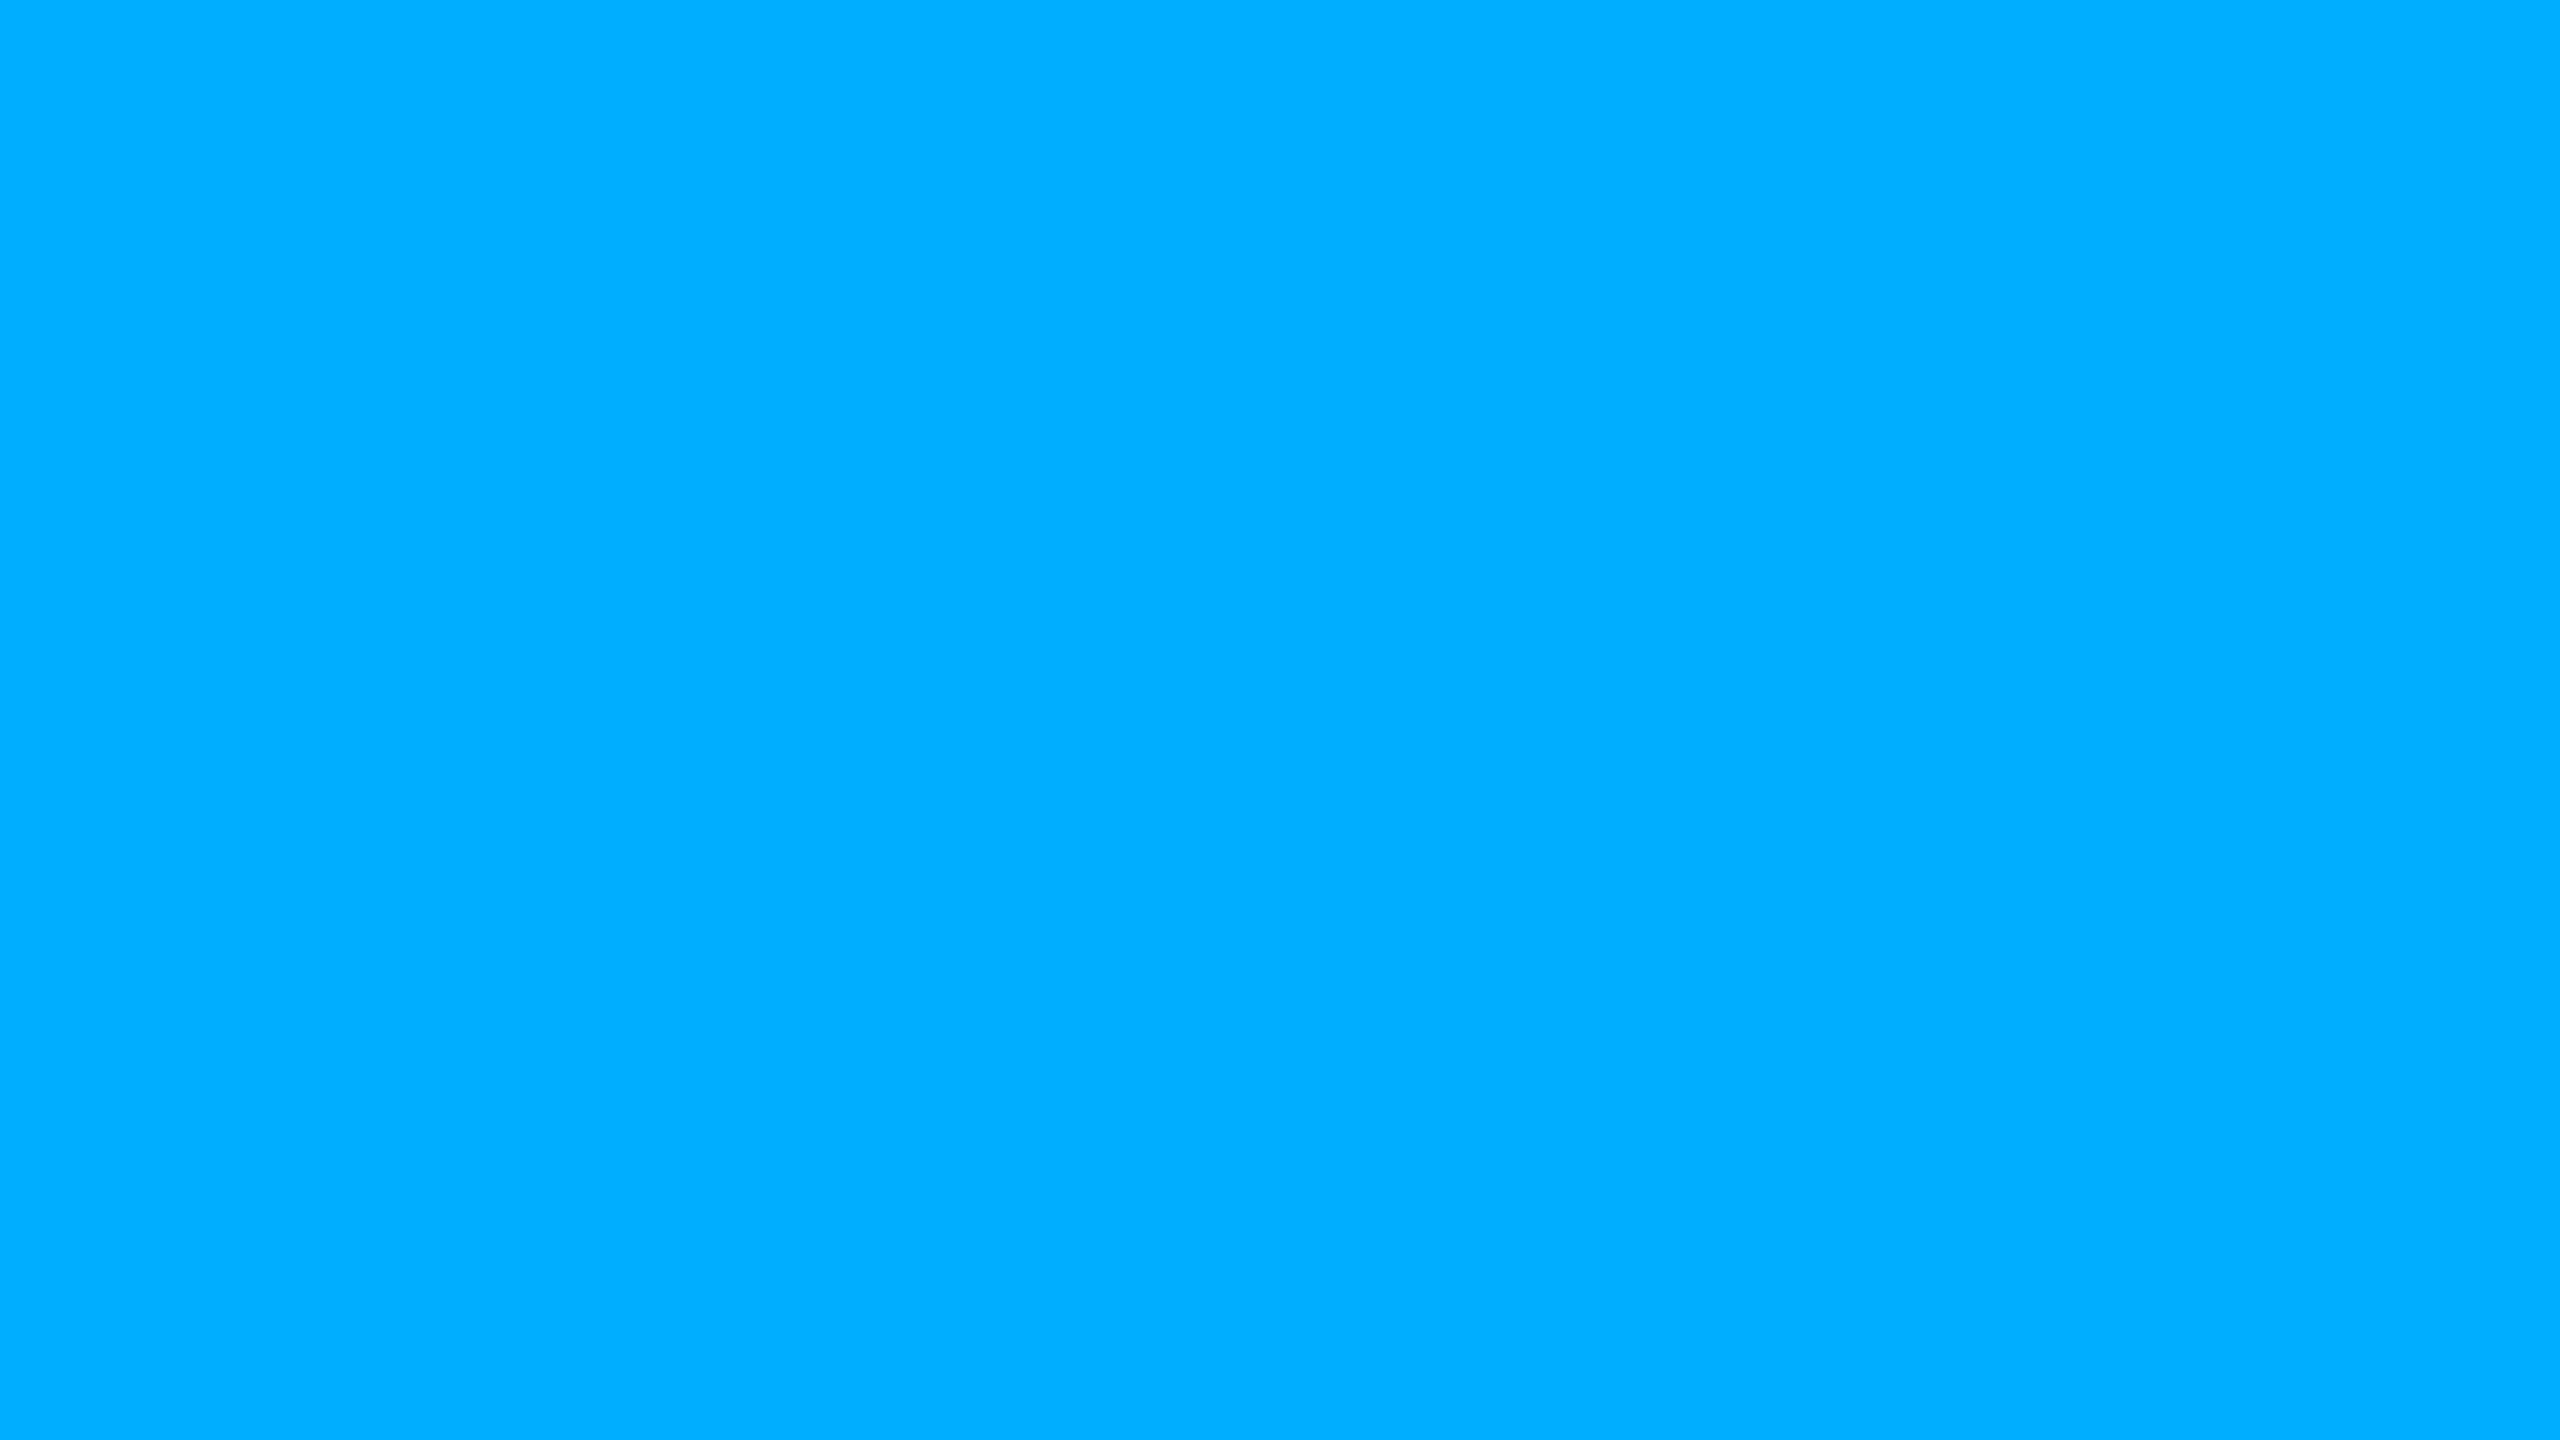 Electric Blue Desktop Wallpaper 2560x1440